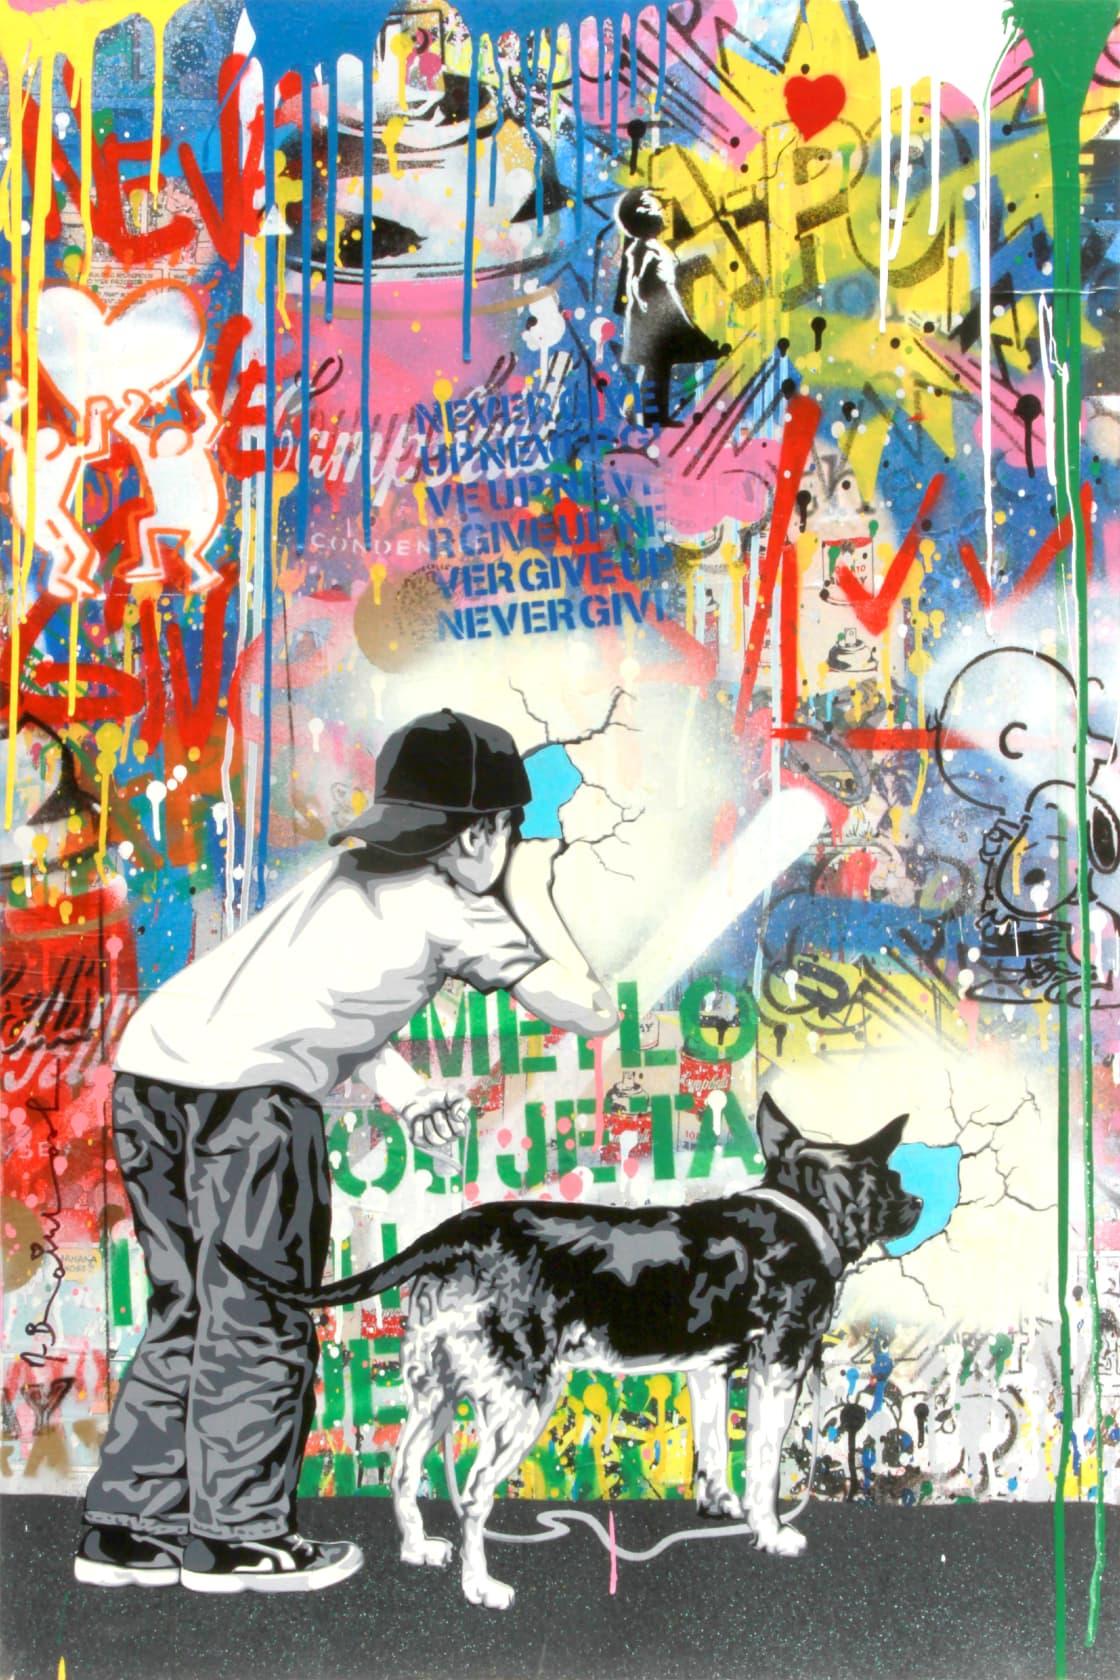 Mr Brainwash Peek A Boo Silkscreen and Mixed Media on Canvas